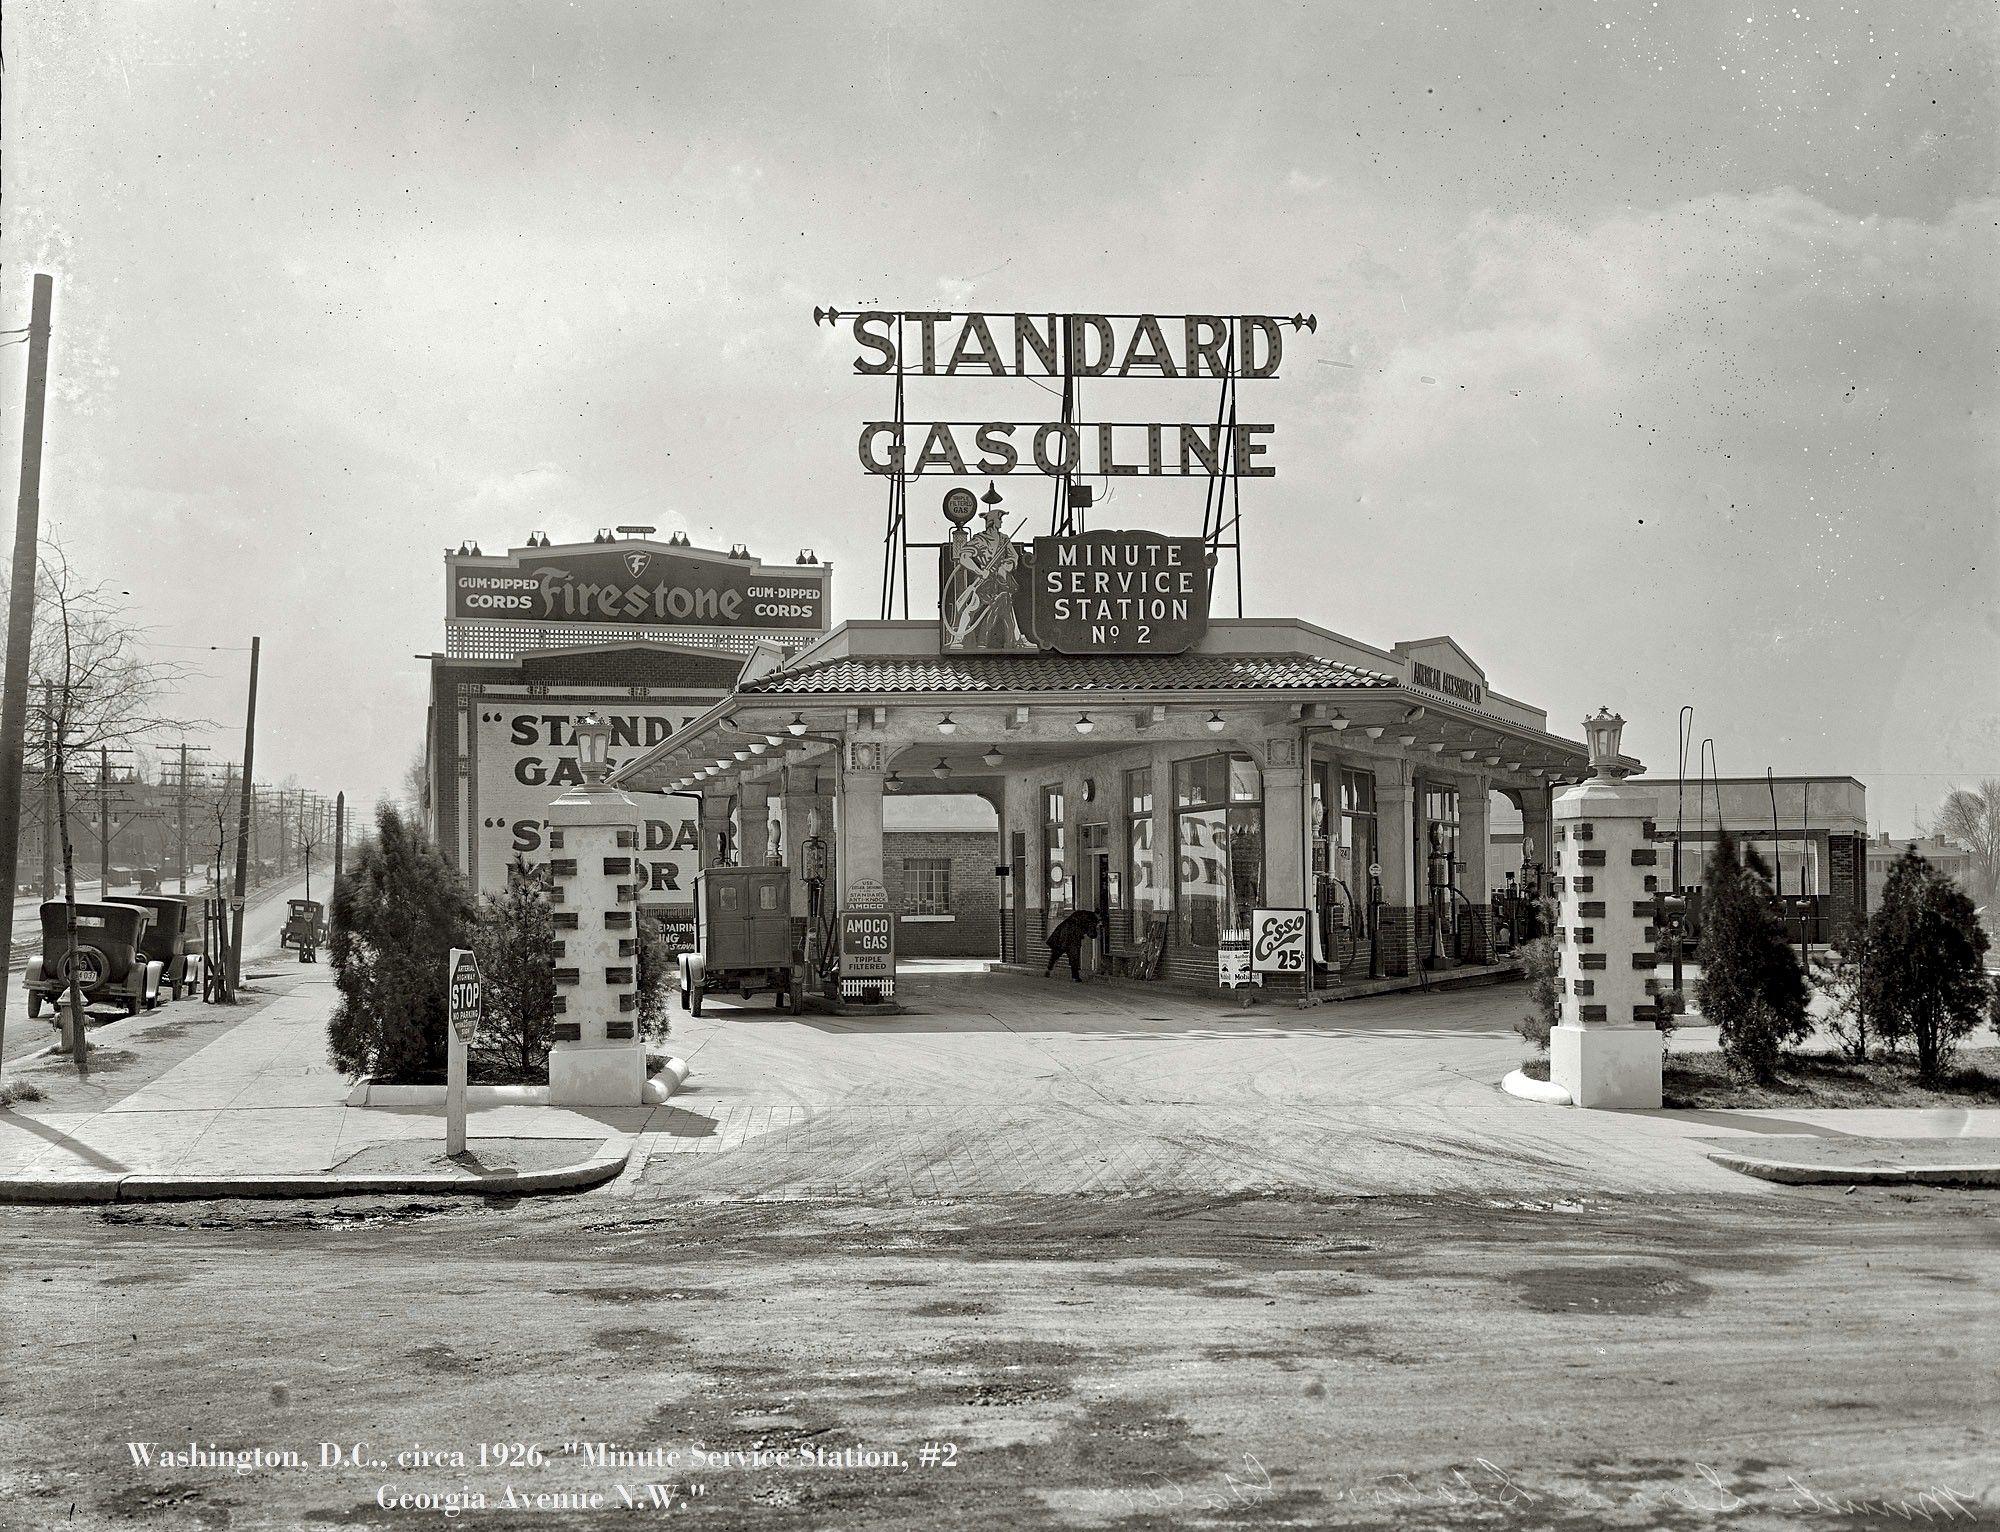 1926 standard oil minute service station no 2